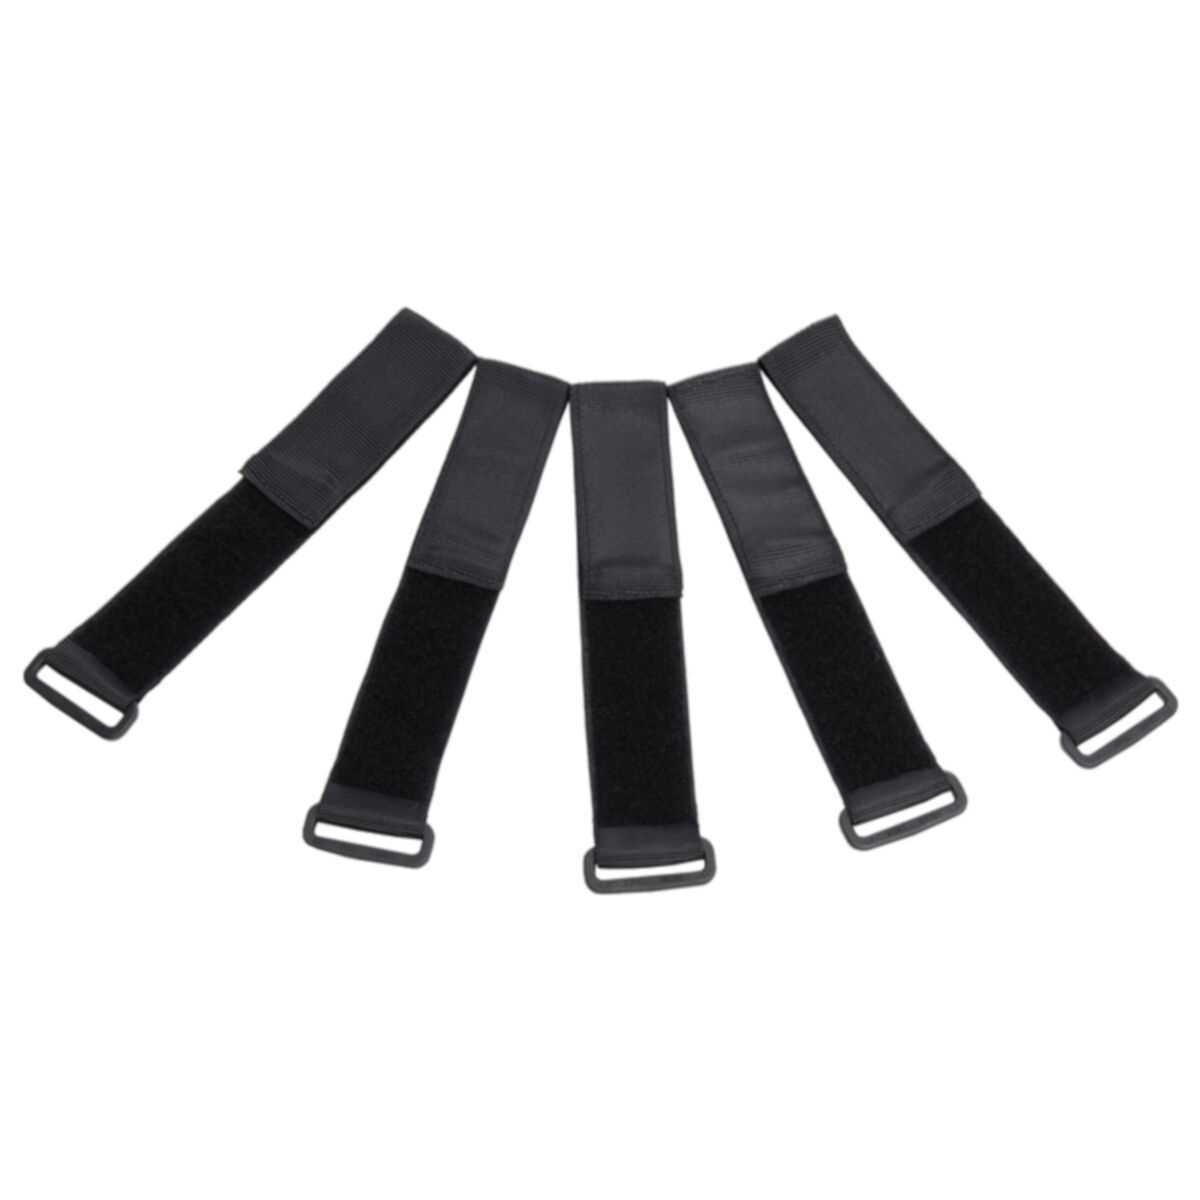 Swagman Swagman Tailwhip Tailgate Pad (Full Size)